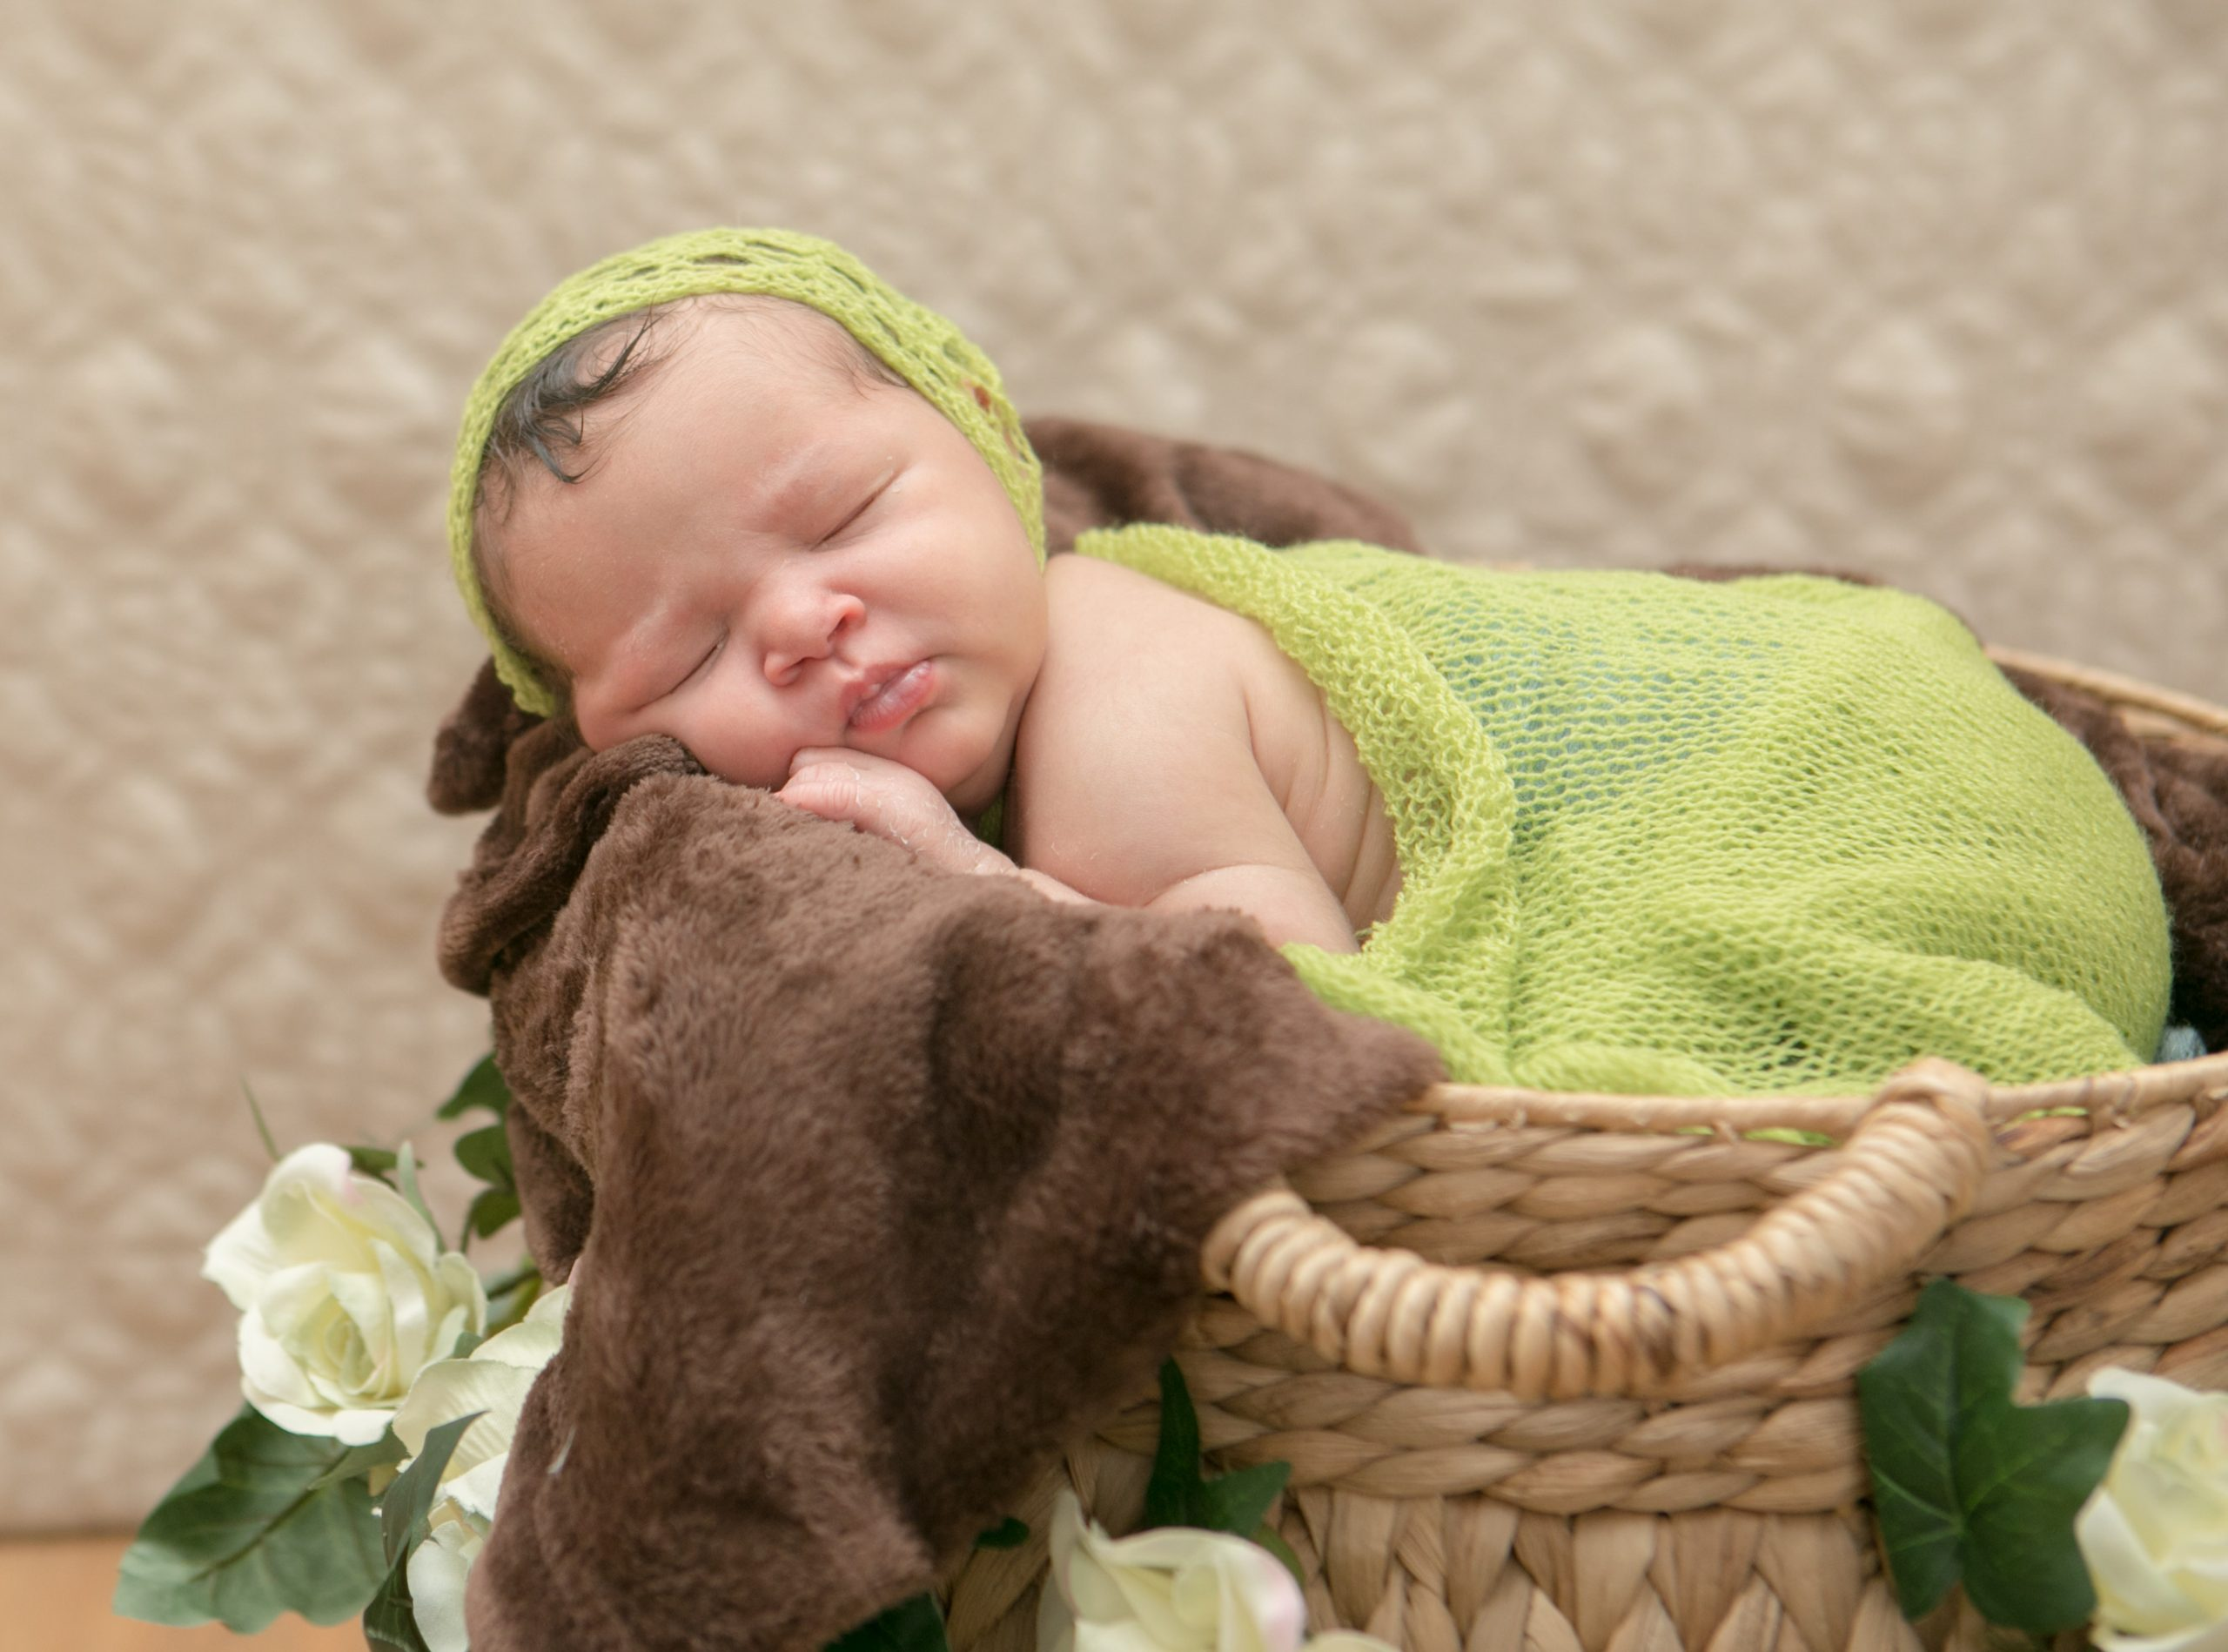 Newborn photoshoot with Baby C, Tania Miller Photography, Cwmbran Newborn Photographer